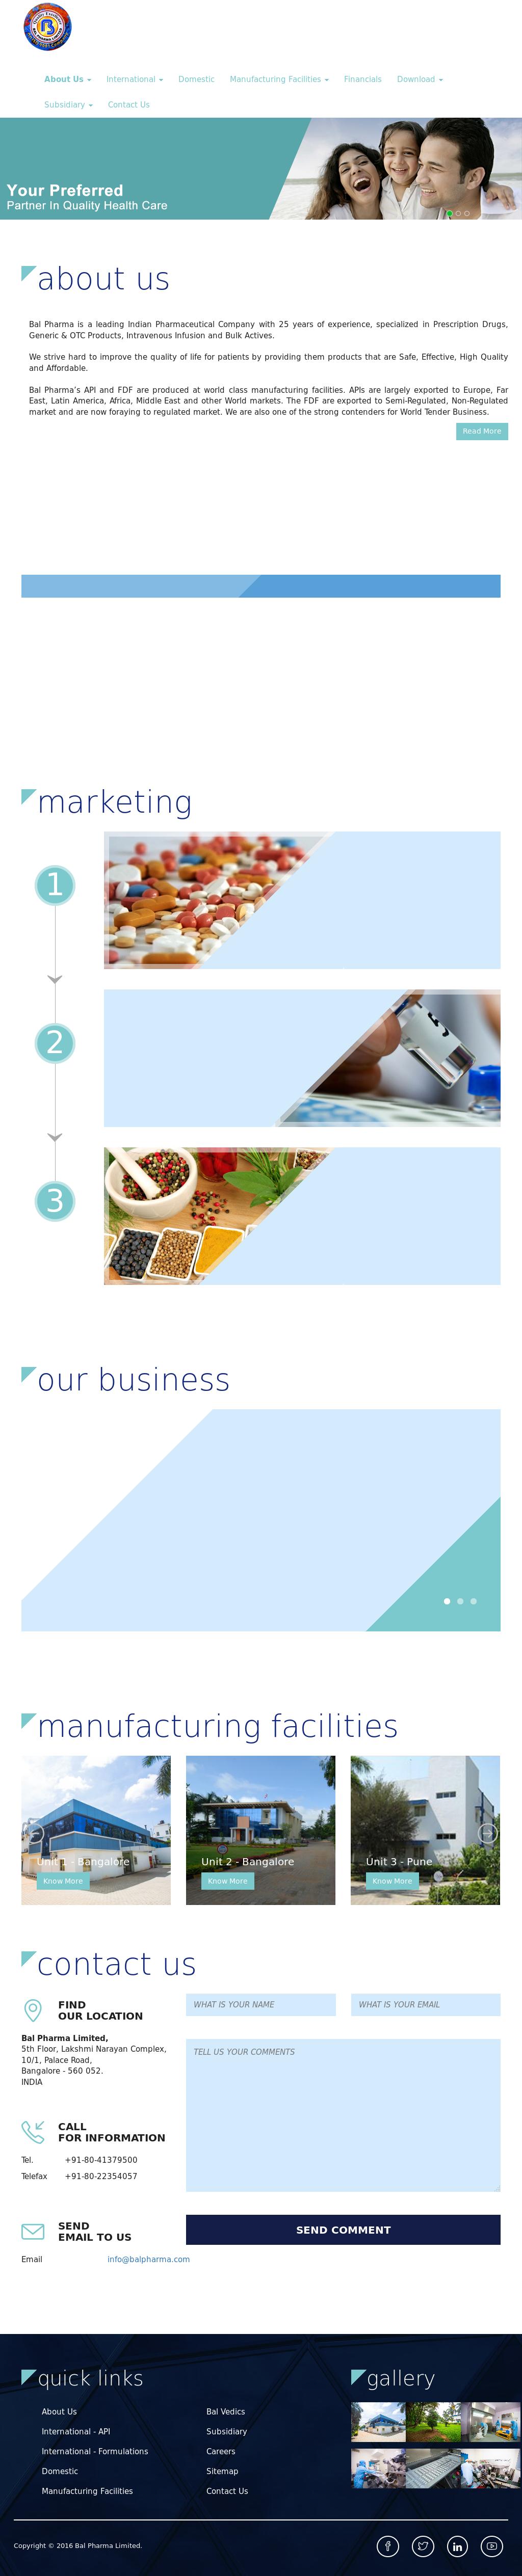 Bal Pharma Competitors, Revenue and Employees - Owler